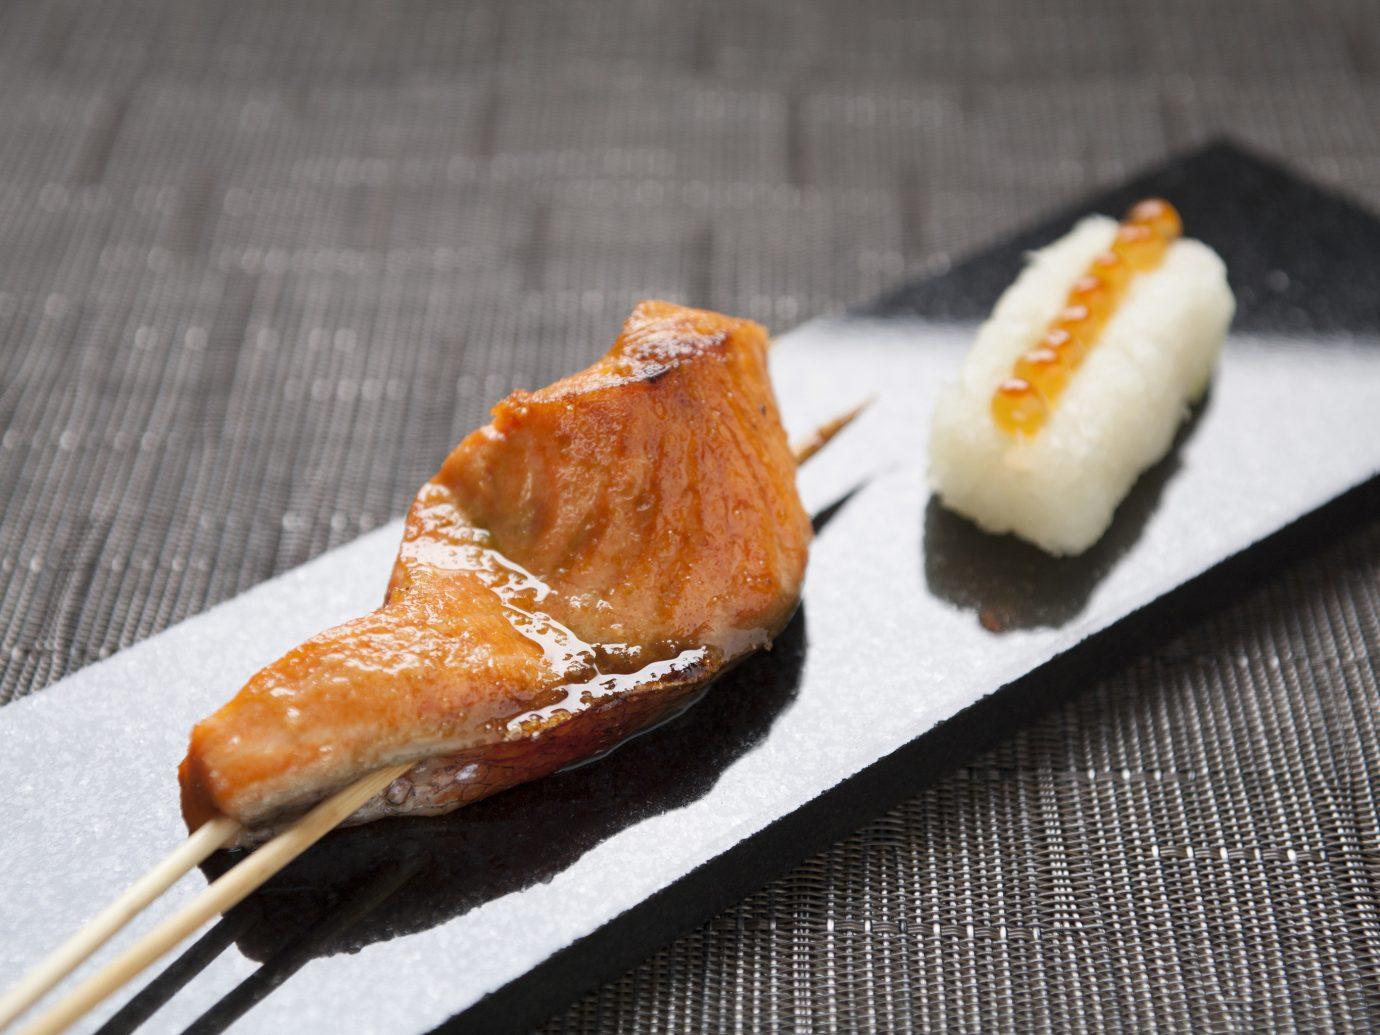 Food + Drink food dish sushi piece cuisine asian food fish slice produce